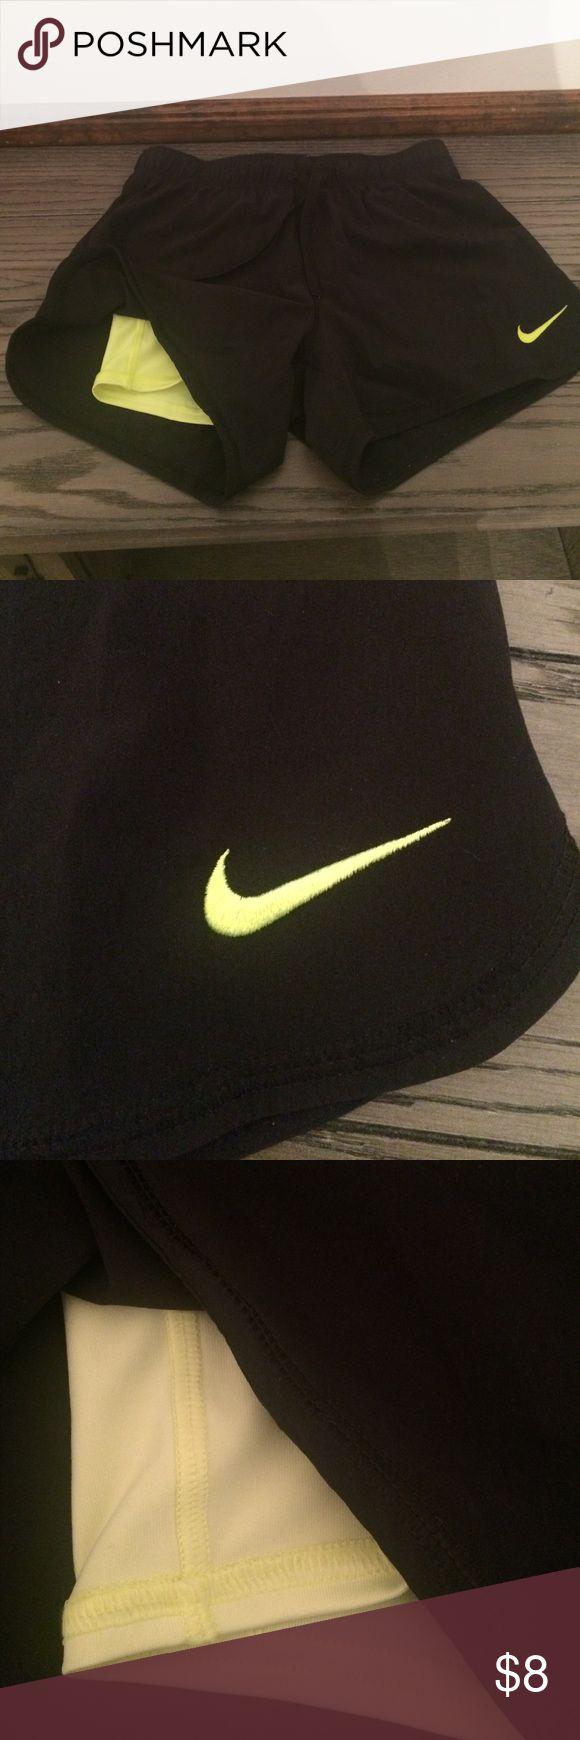 Nike women's 2 in 1 phantom shorts size XS Nike women's 2 in 1 phantom shorts. Size XS. Black and neon yellow. Shorts feature under tight shorts. Nike Shorts